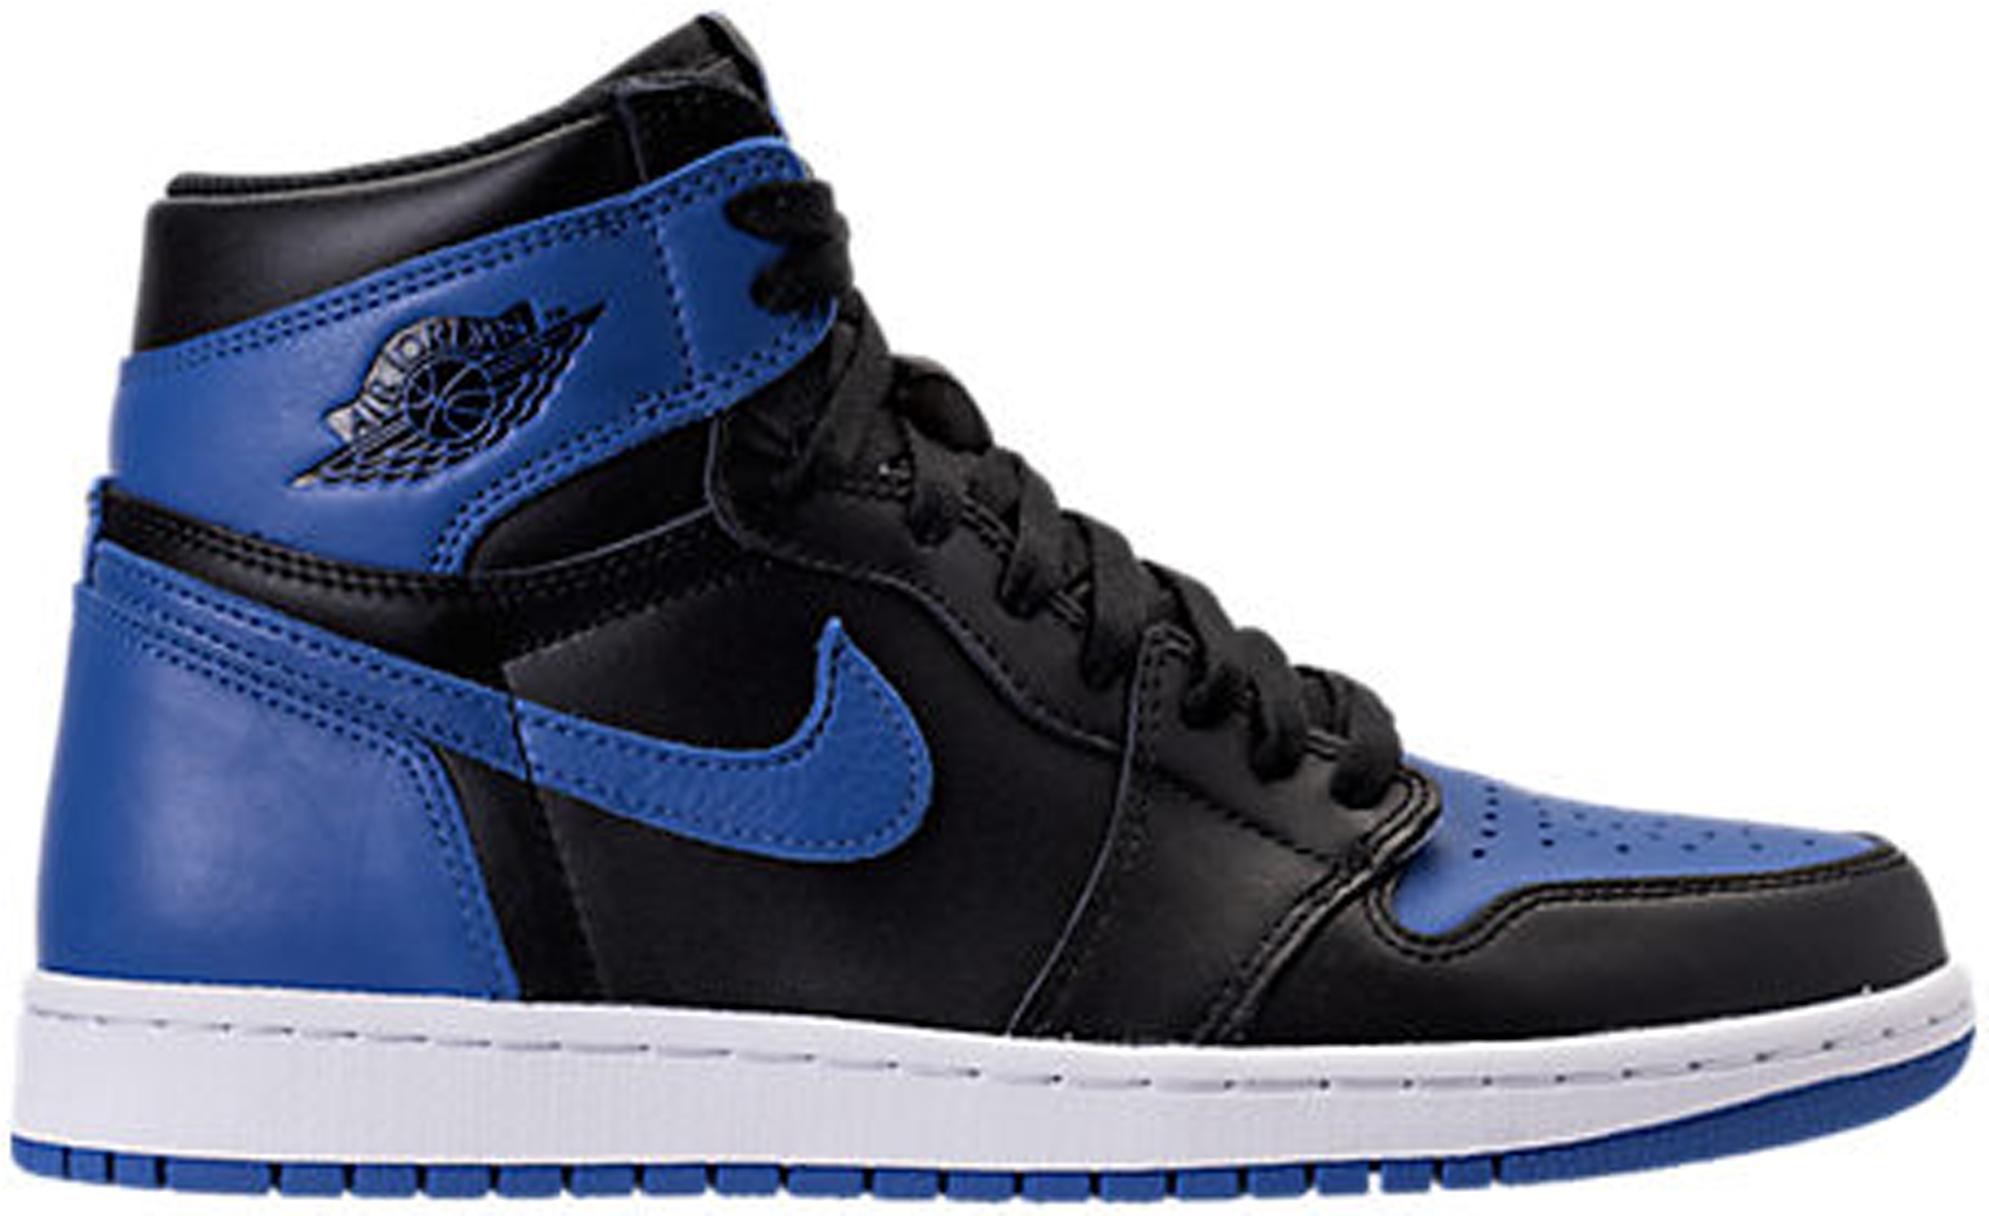 Air Jordan 1 Chaussures De Sport De Tempête Stock Bleu X